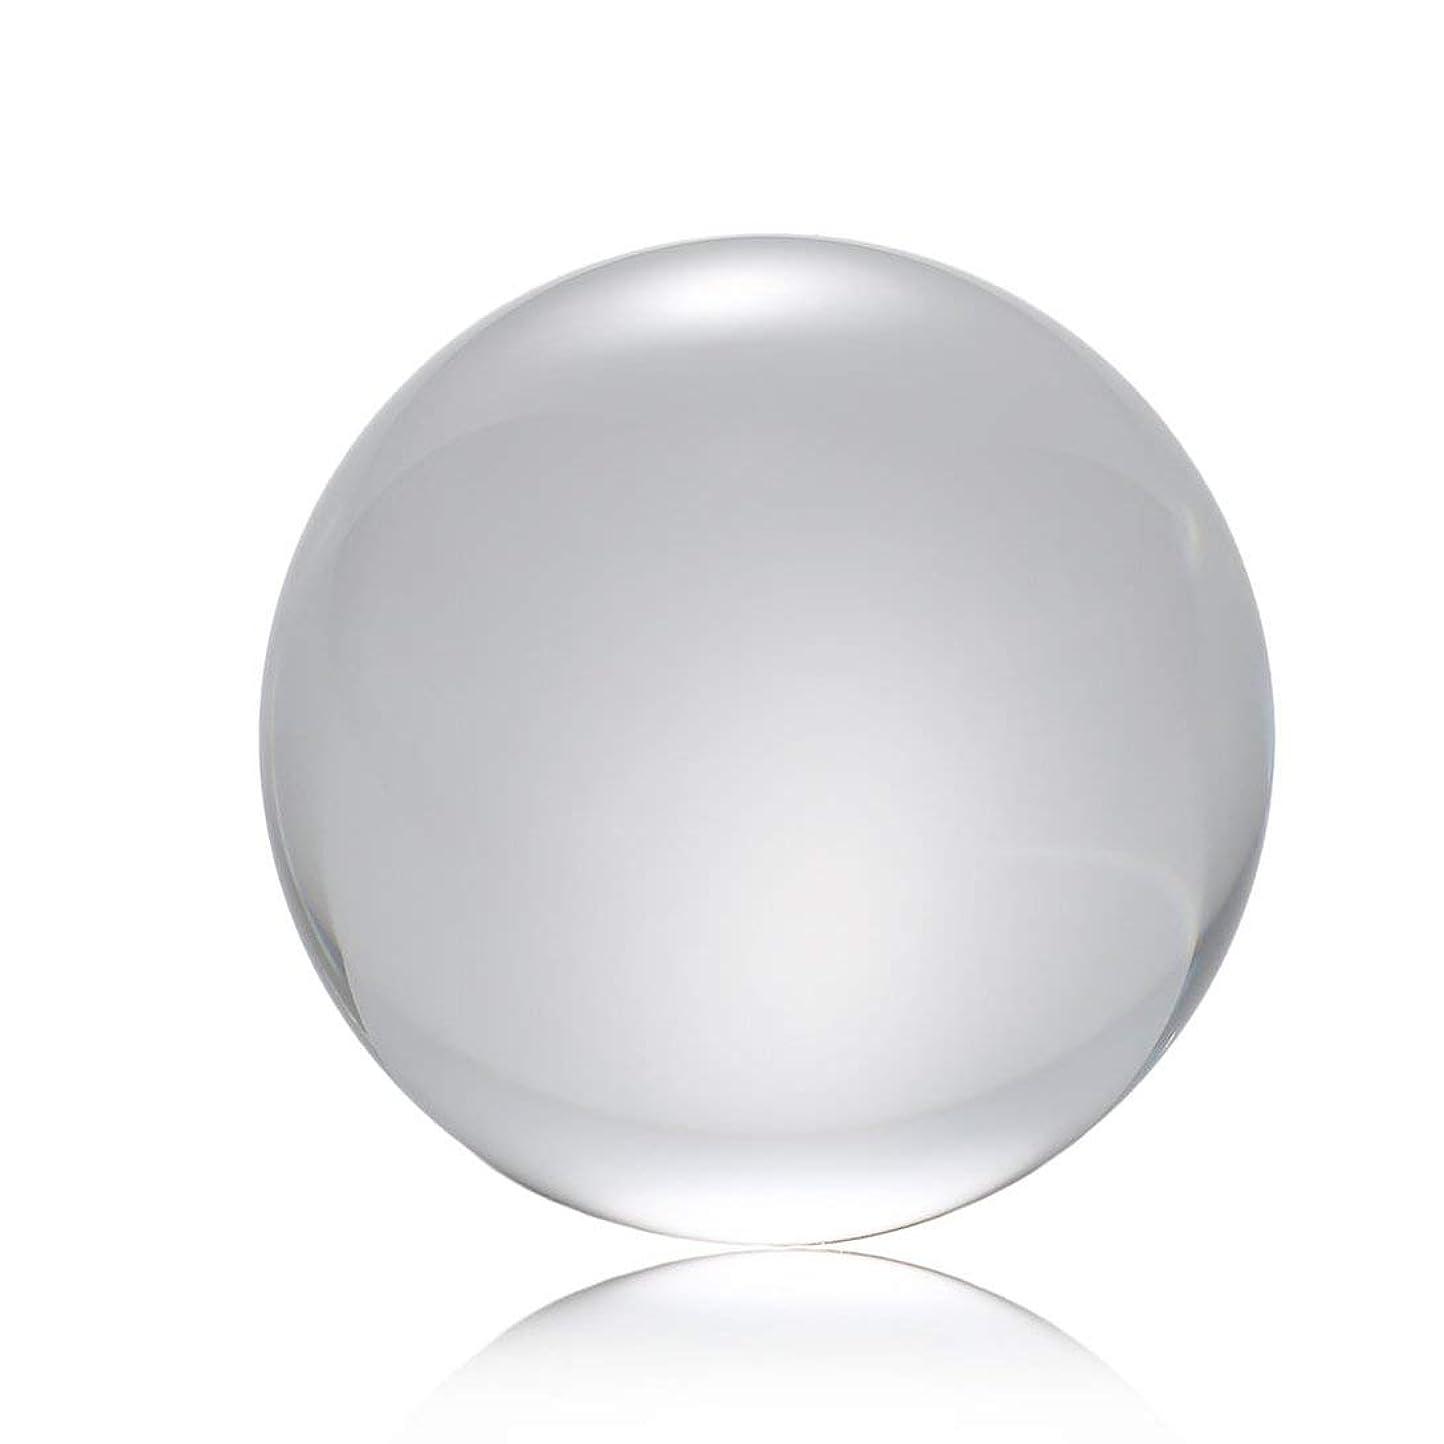 Swiftgood 50ミリメートル/ 80ミリメートル/ 100ミリメートルクリスタルボールクォーツガラス透明ボール球風水ガラス玉ミニチュア装飾品ギフト